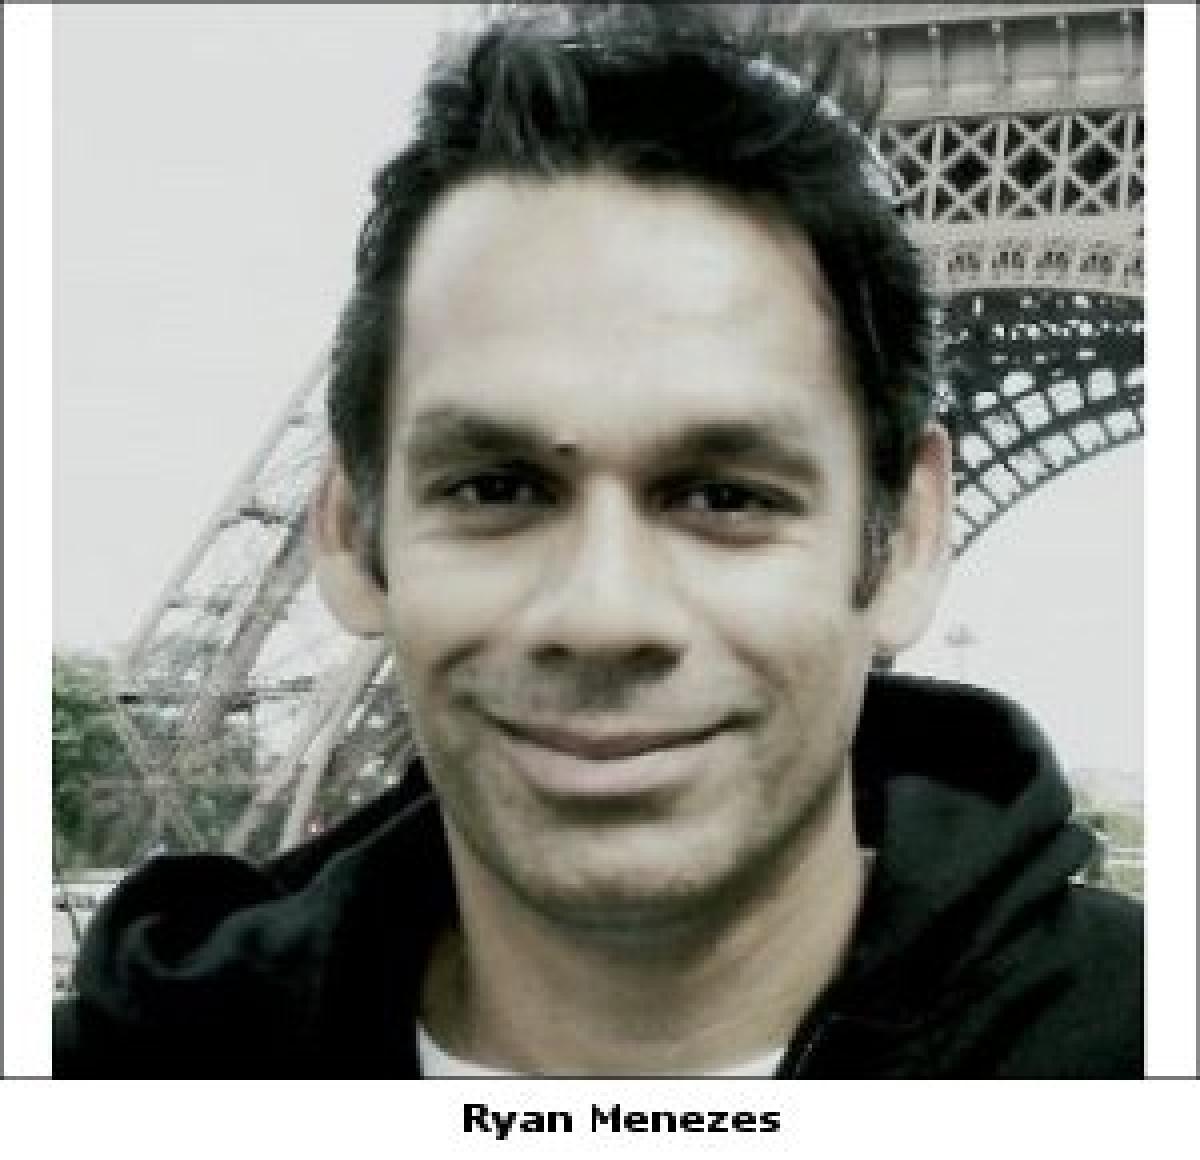 Ryan Menezes, Chief Creative Officer, Percept/H, Quits